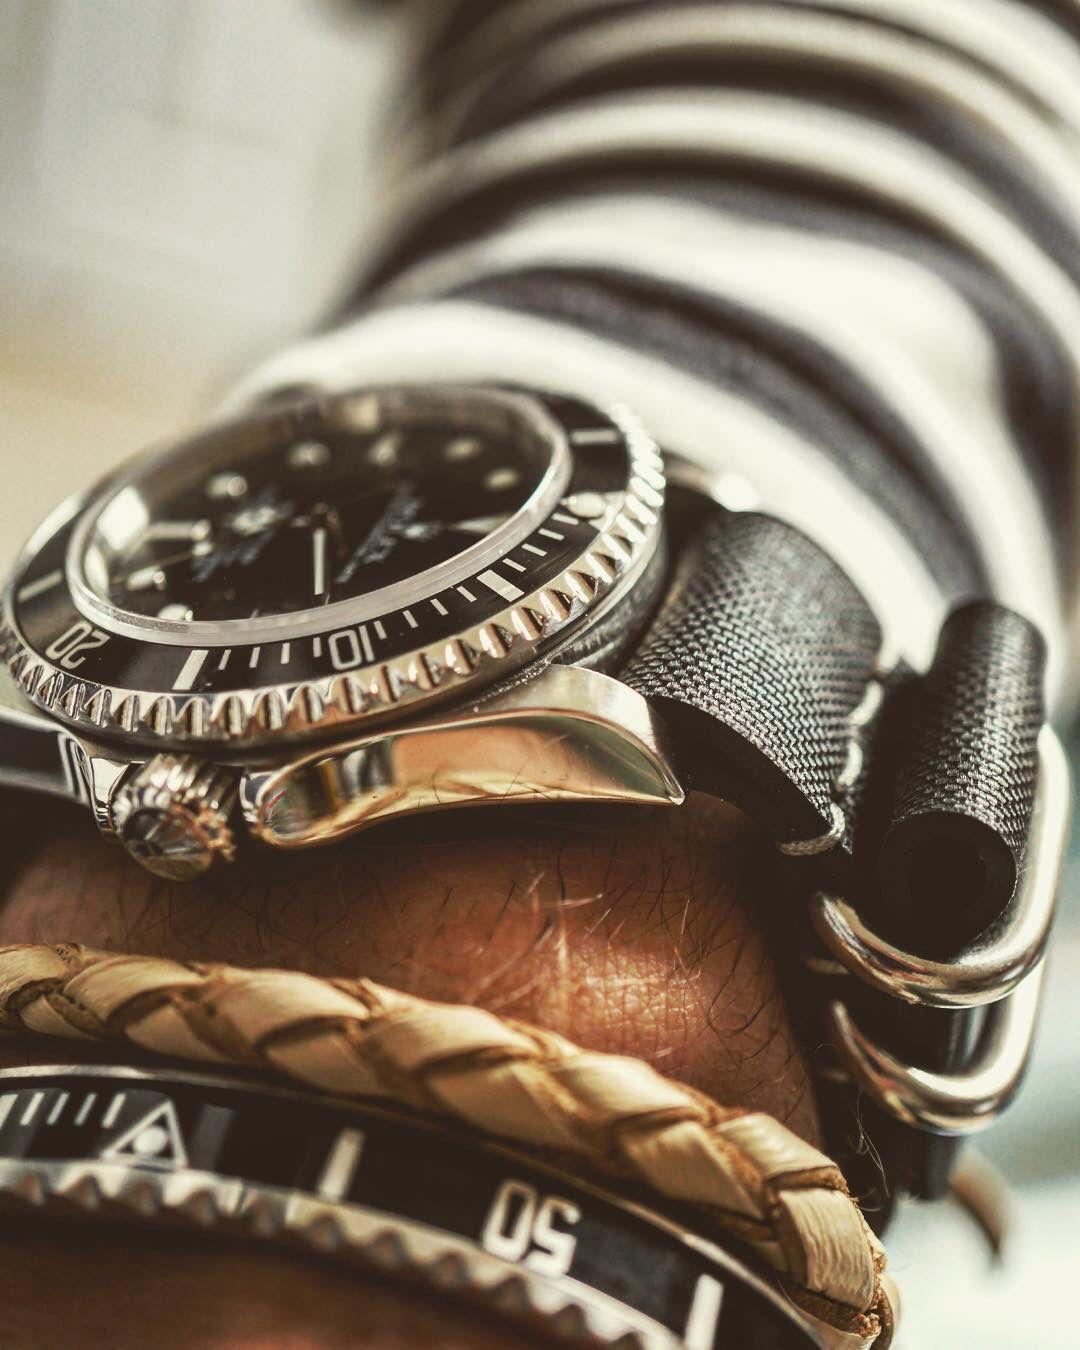 For a sporty Day!! #speedometerofficial #speedometerbracelets #bracelet  #madeinitaly #luxury #luxurybrand #fashion #style #italiandesign #italianstyle #watchpic #watchoftheday #picoftheday